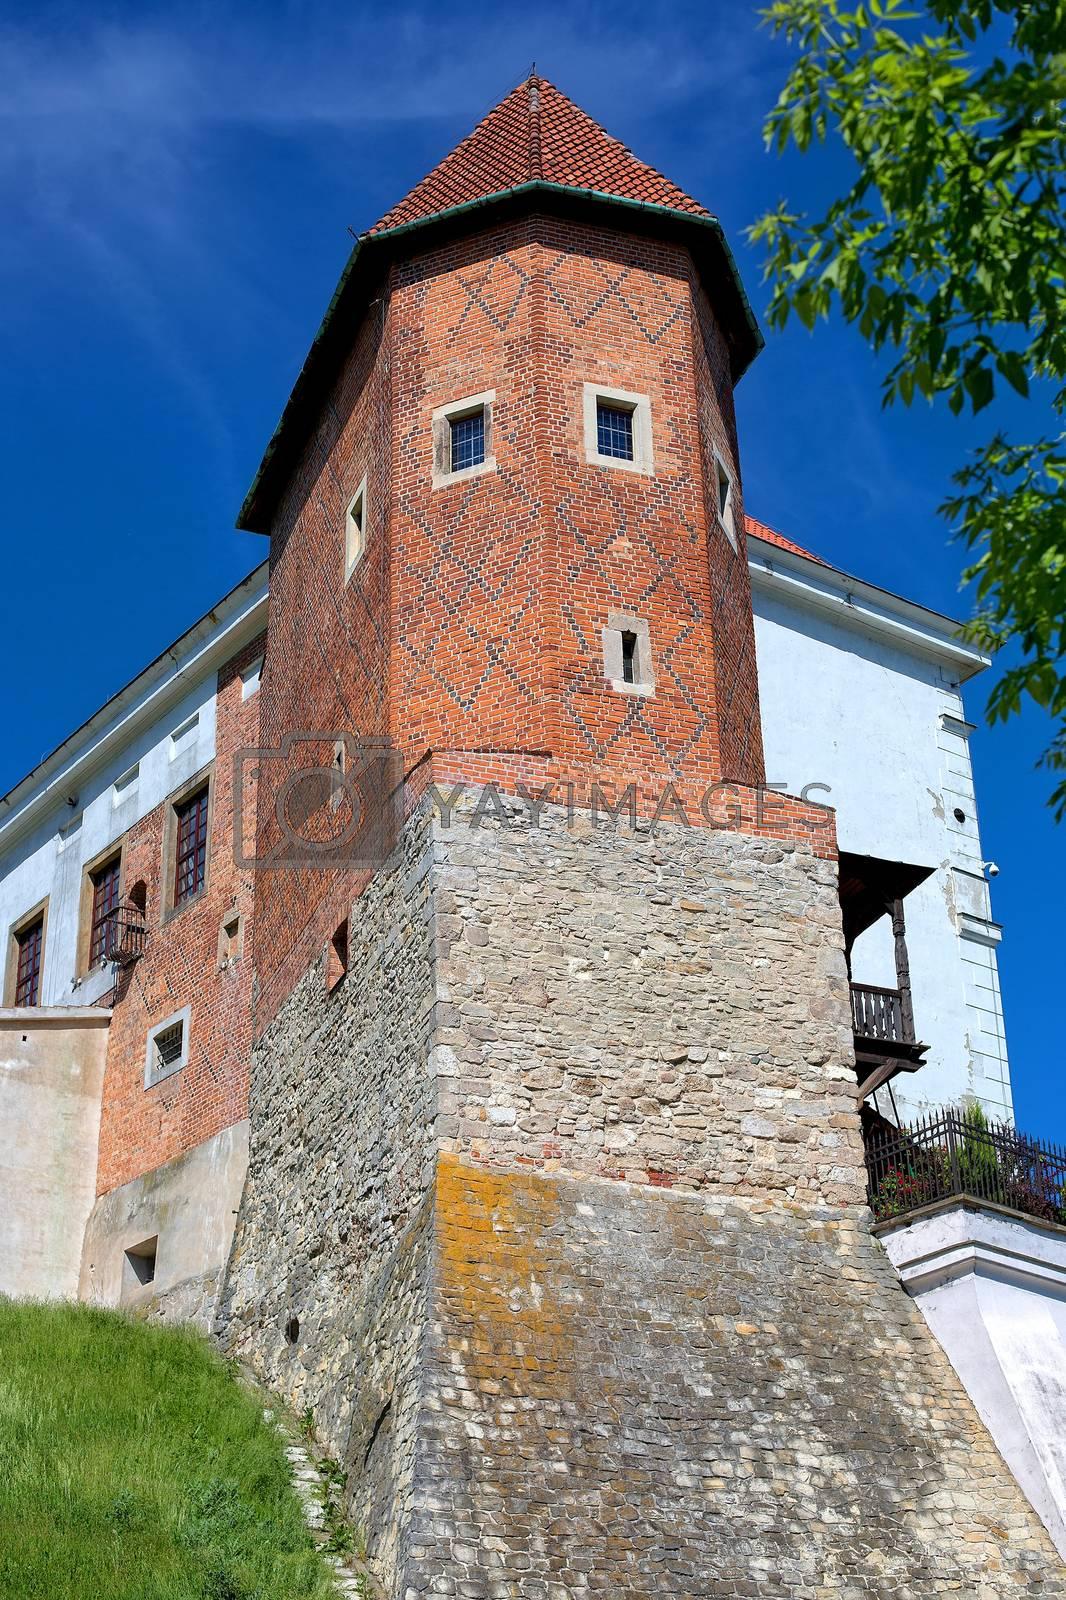 Royal Castle in Sandomierz in Poland